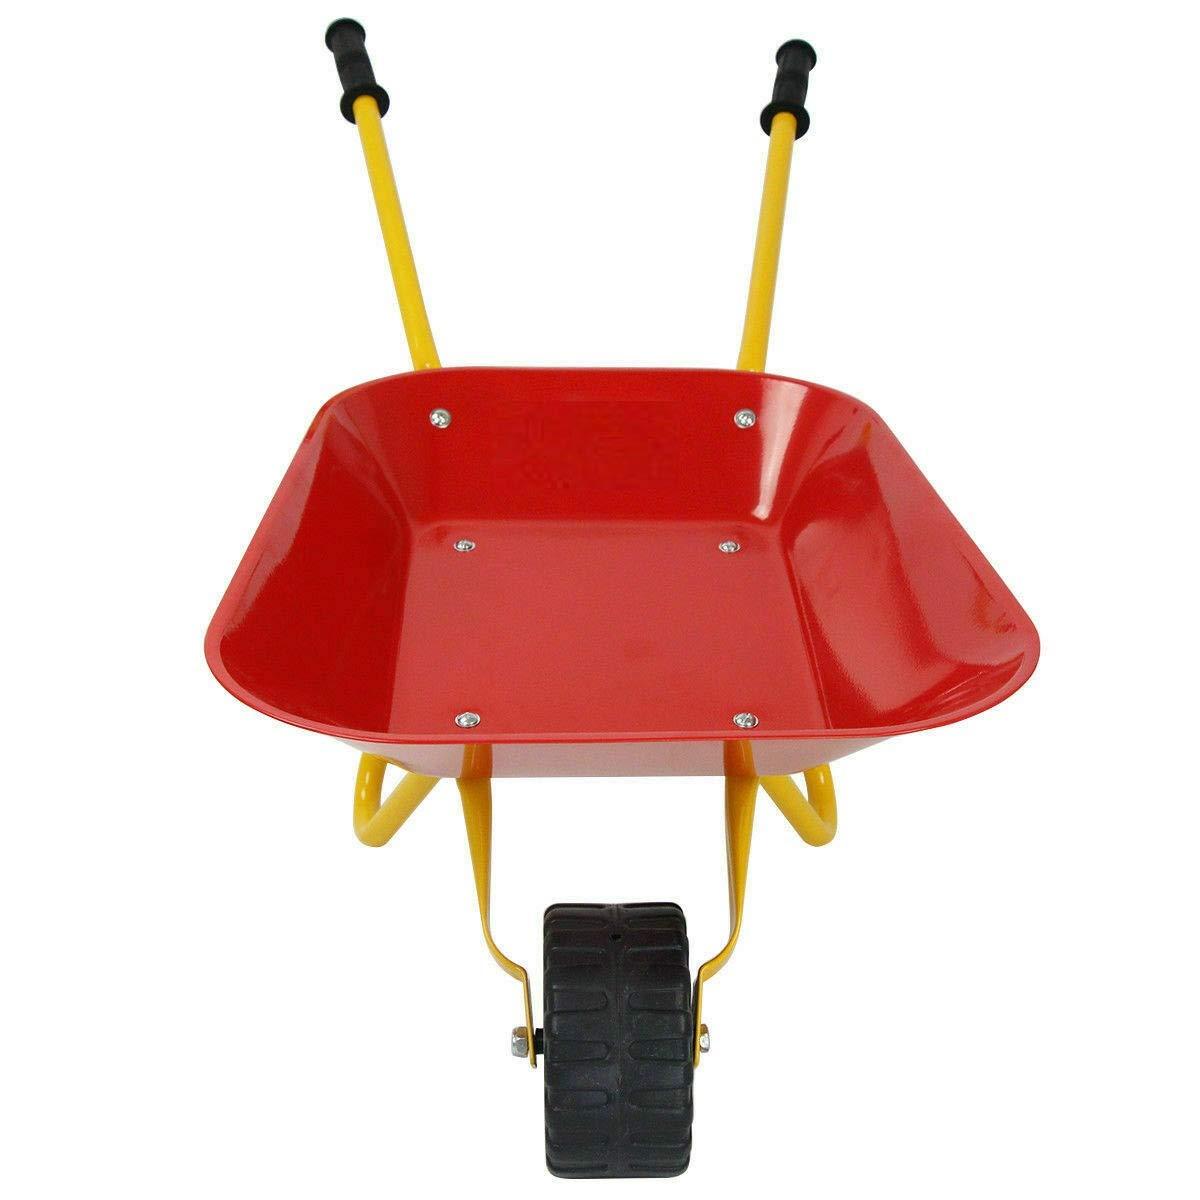 Heize best price Red Kids Metal Wheelbarrow Children's Size Outdoor Garden Backyard Play Toy by Heize best price (Image #6)